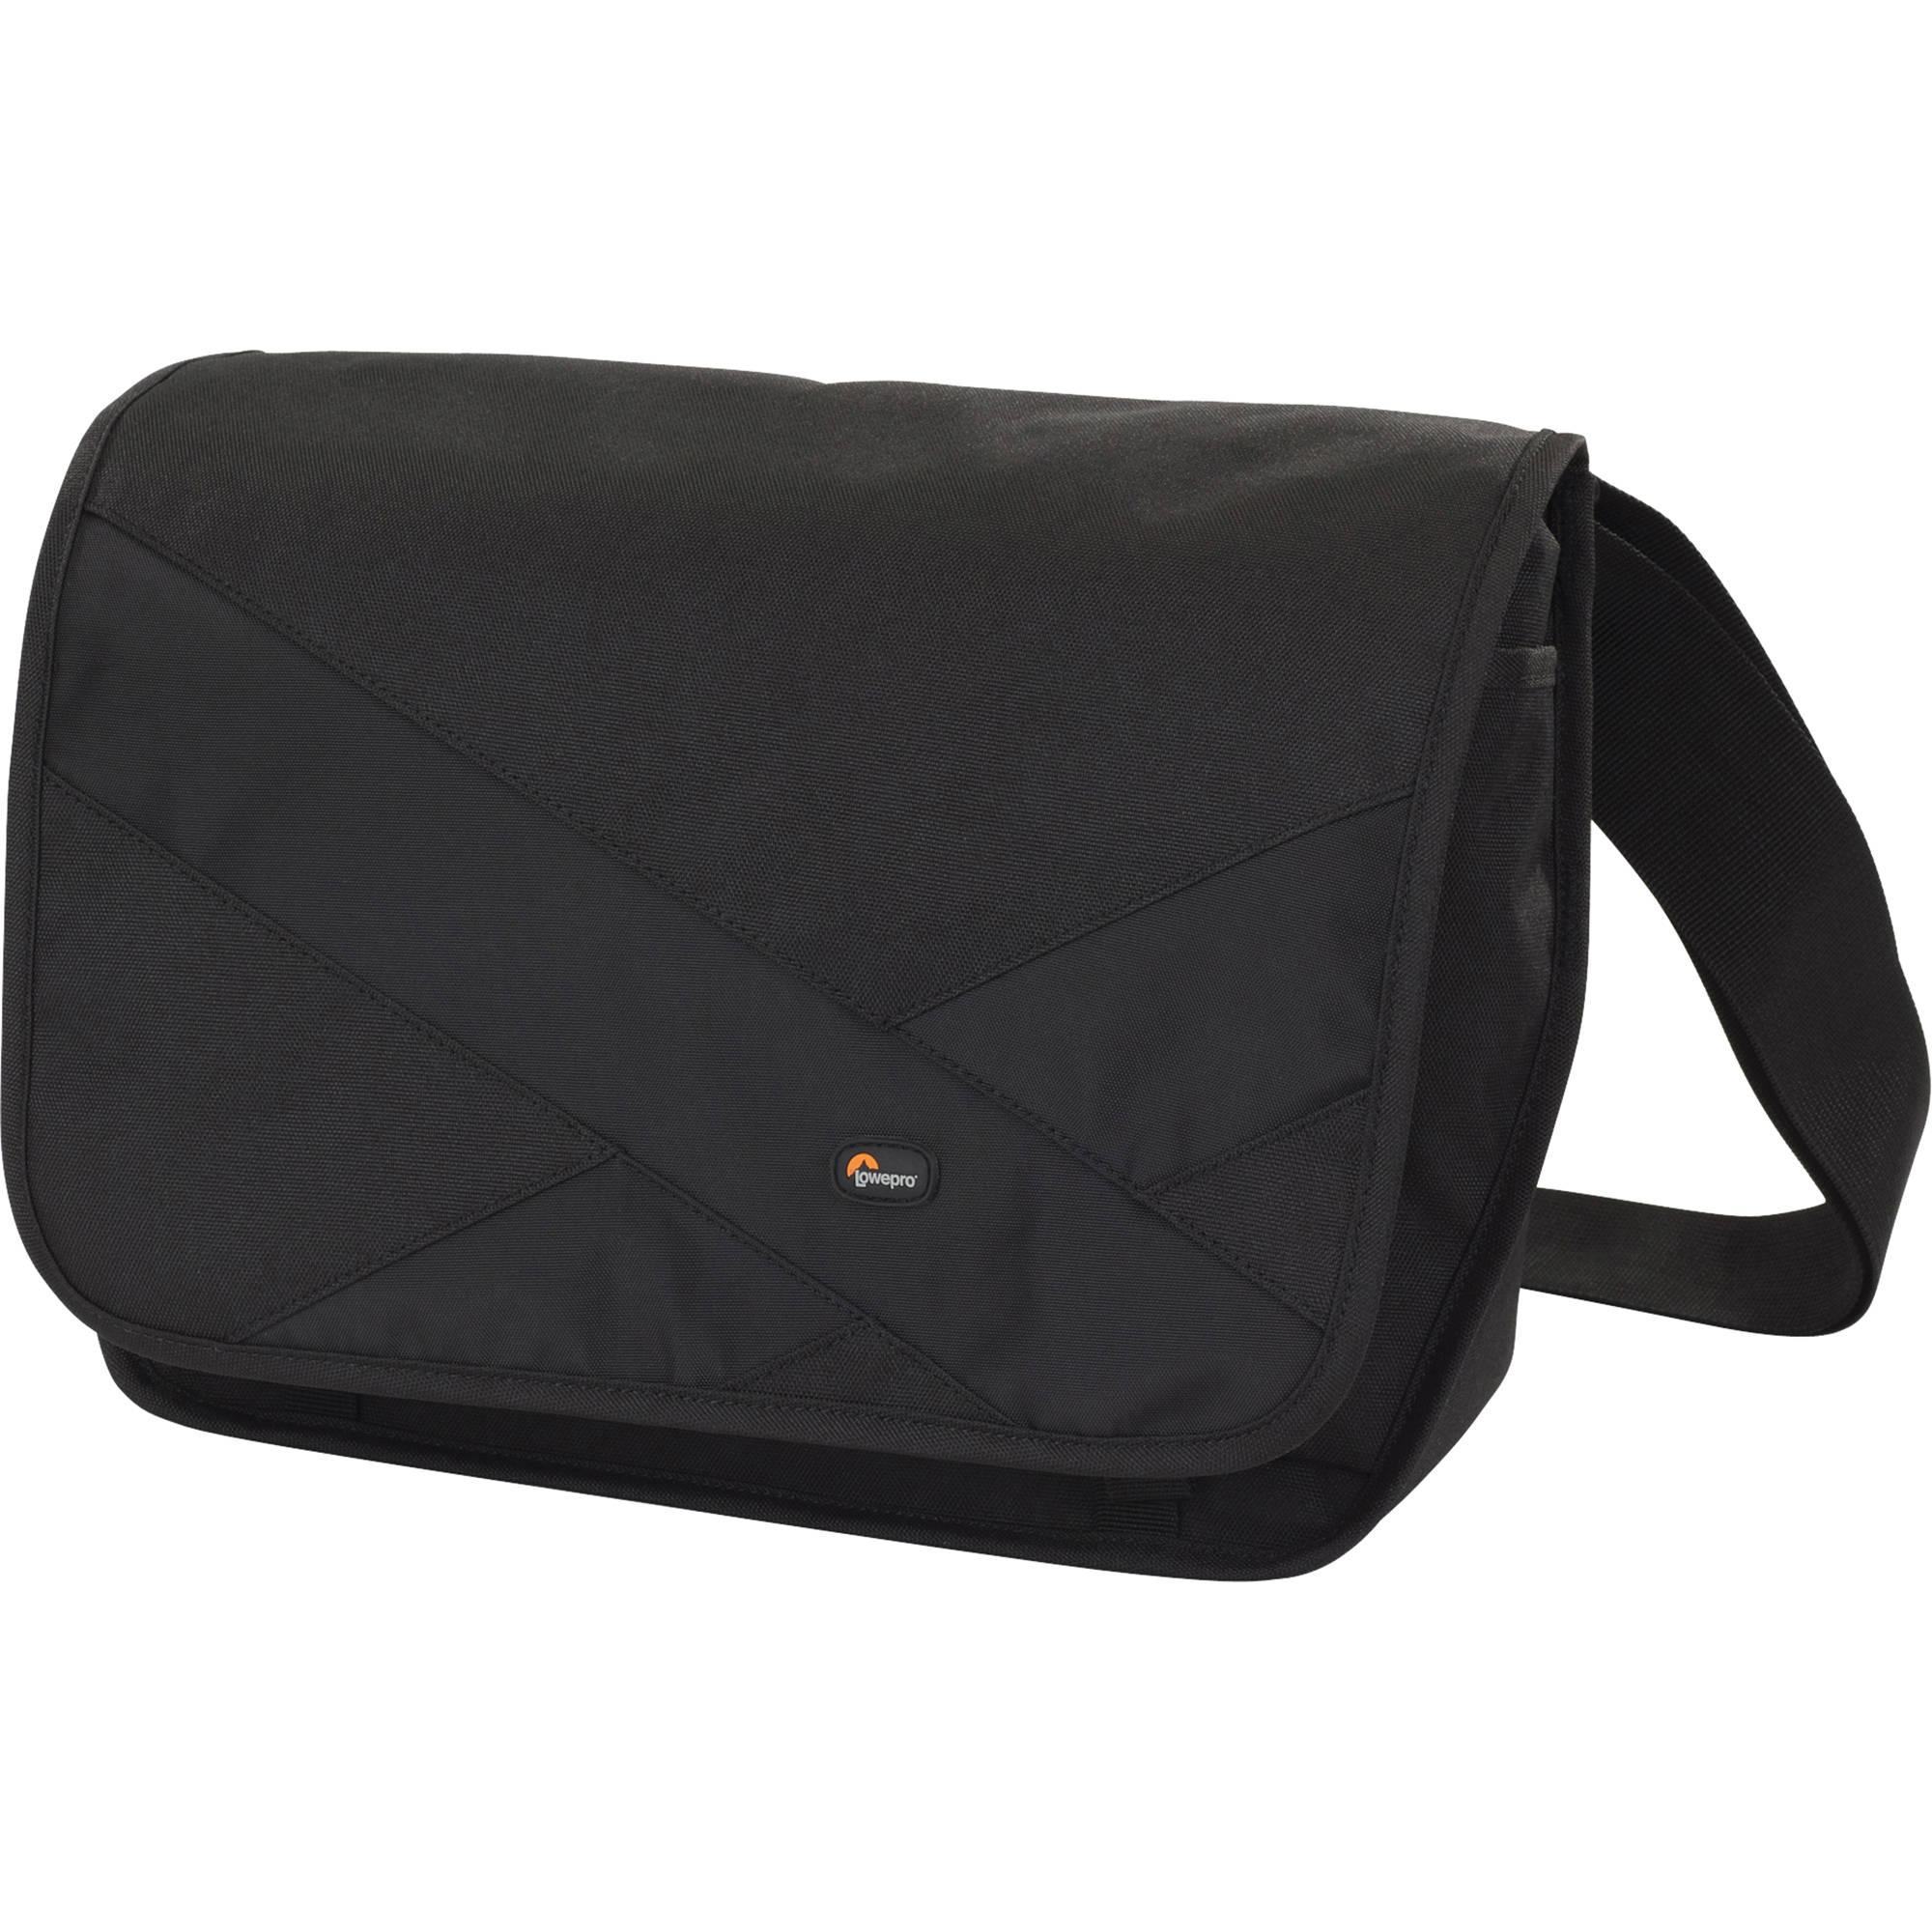 Lowepro Exchange Messenger Bag Black